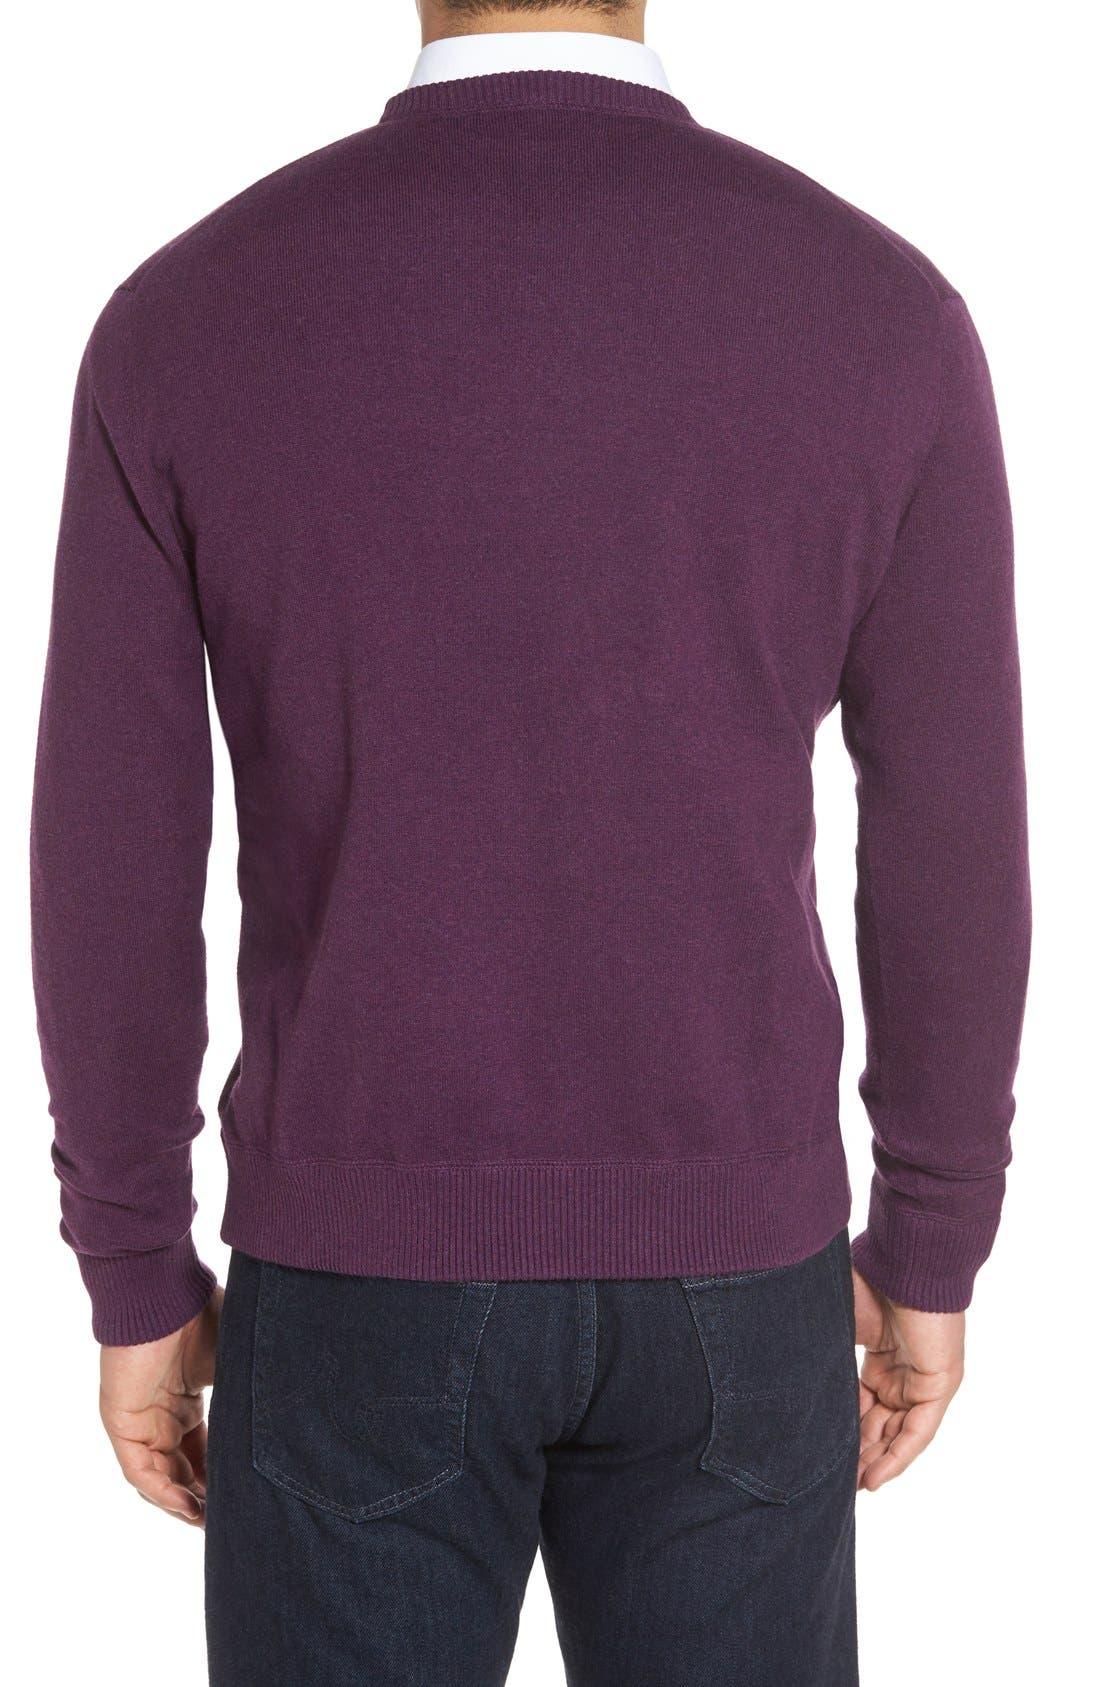 'Jersey Sport' Cotton Blend Crewneck Sweater,                             Alternate thumbnail 14, color,